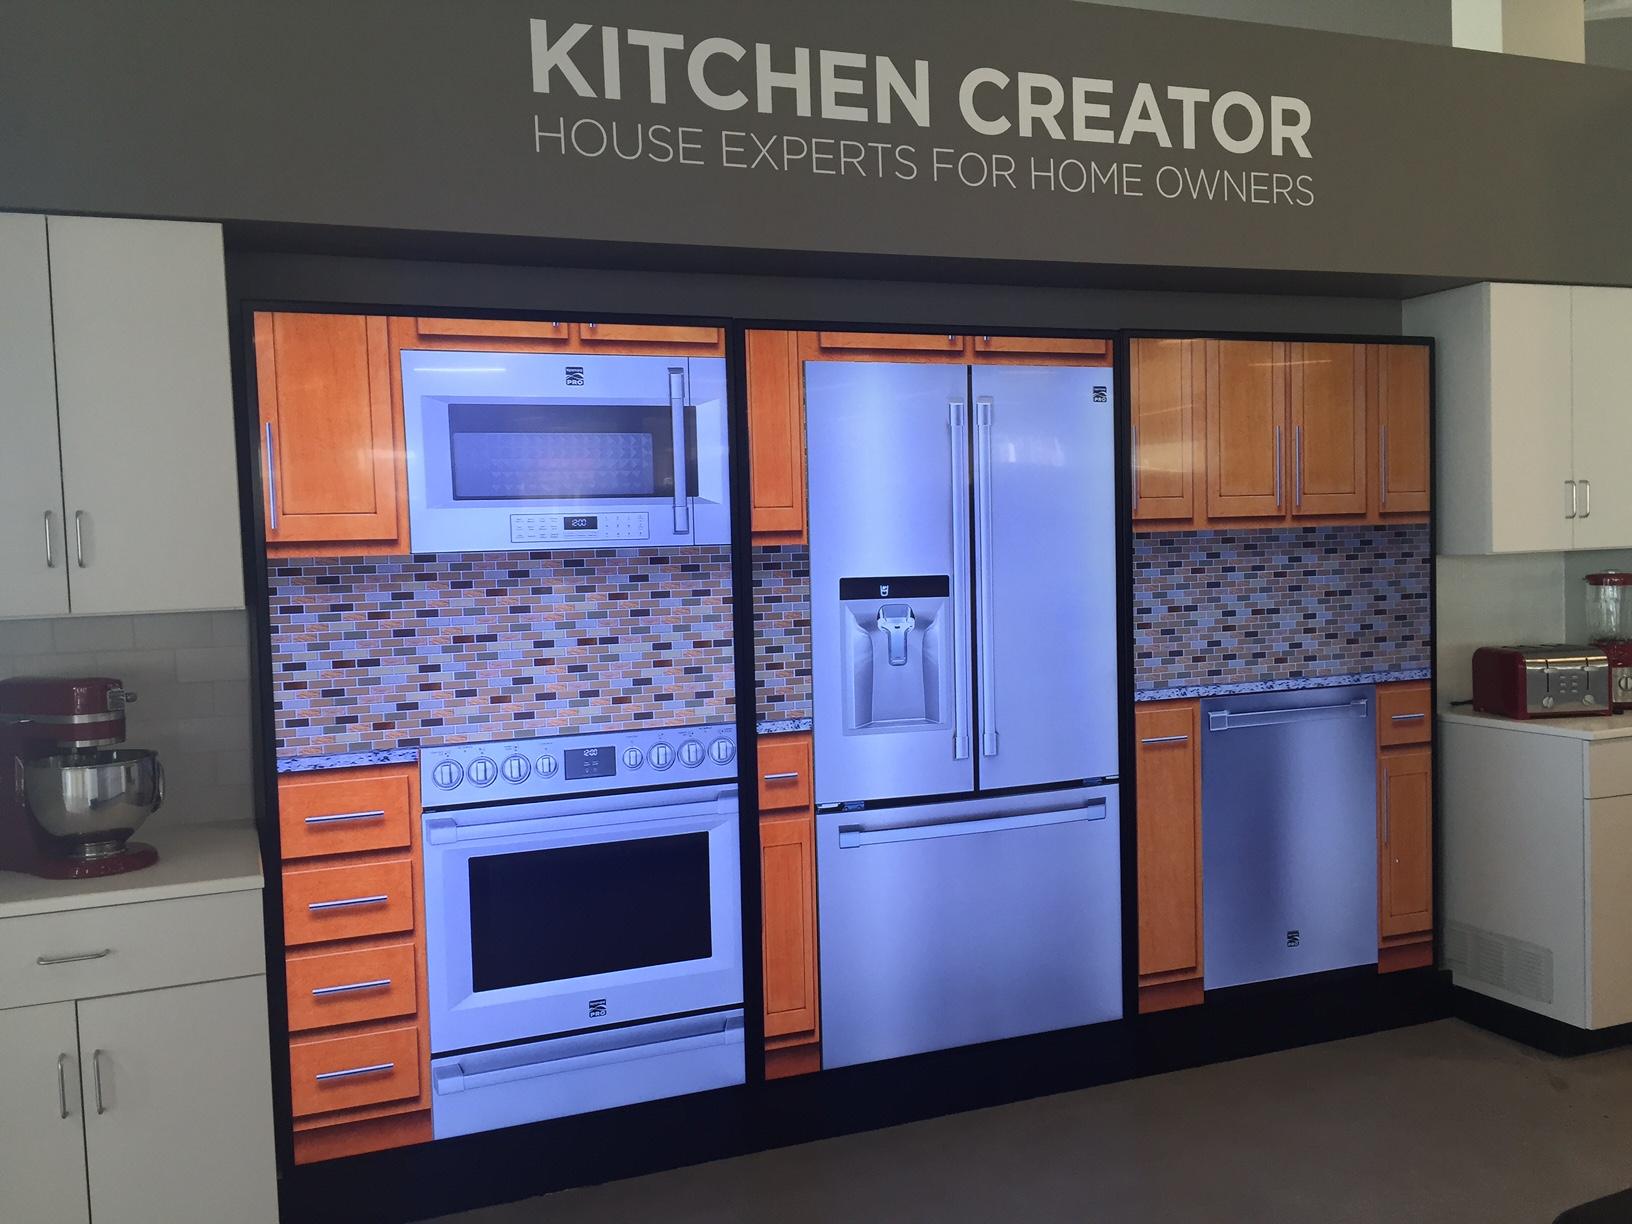 Charming Sears Kitchen Creator